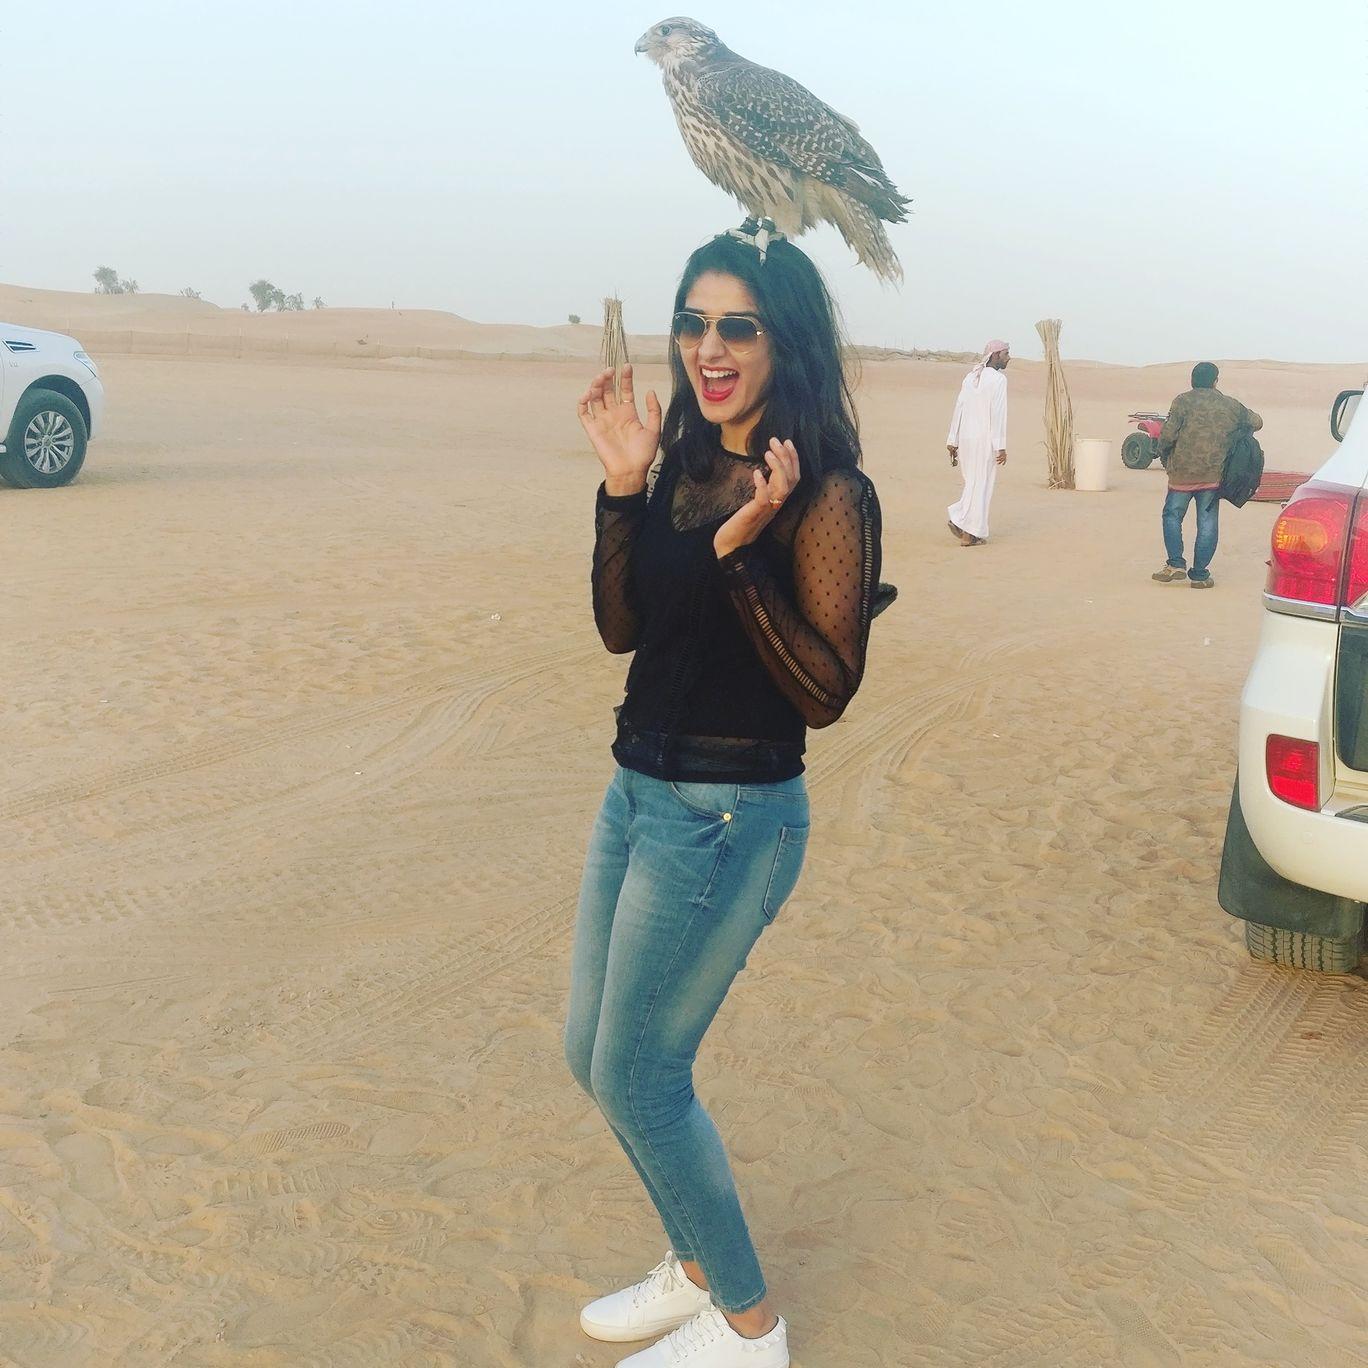 Photo of Desert Safari Dubai - Best Dune Bashing Safari - Dubai - United Arab Emirates By Mansi Singh